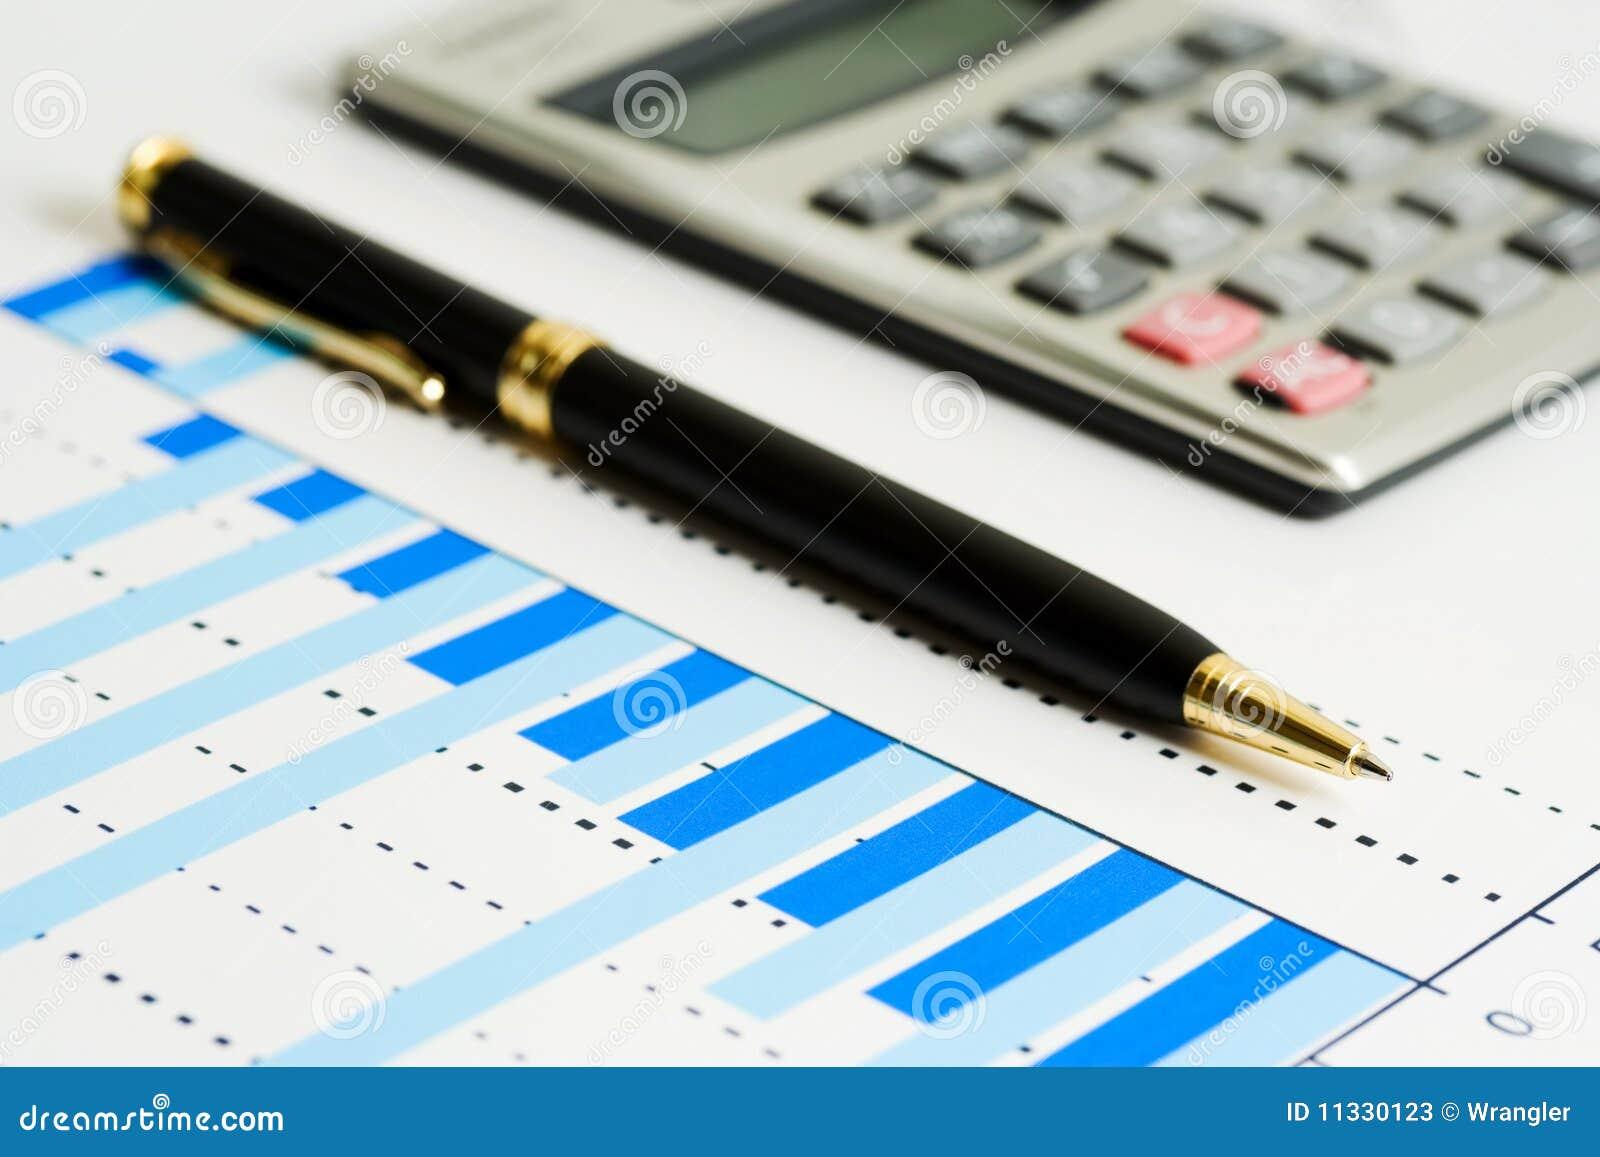 Mark-to-market accounting